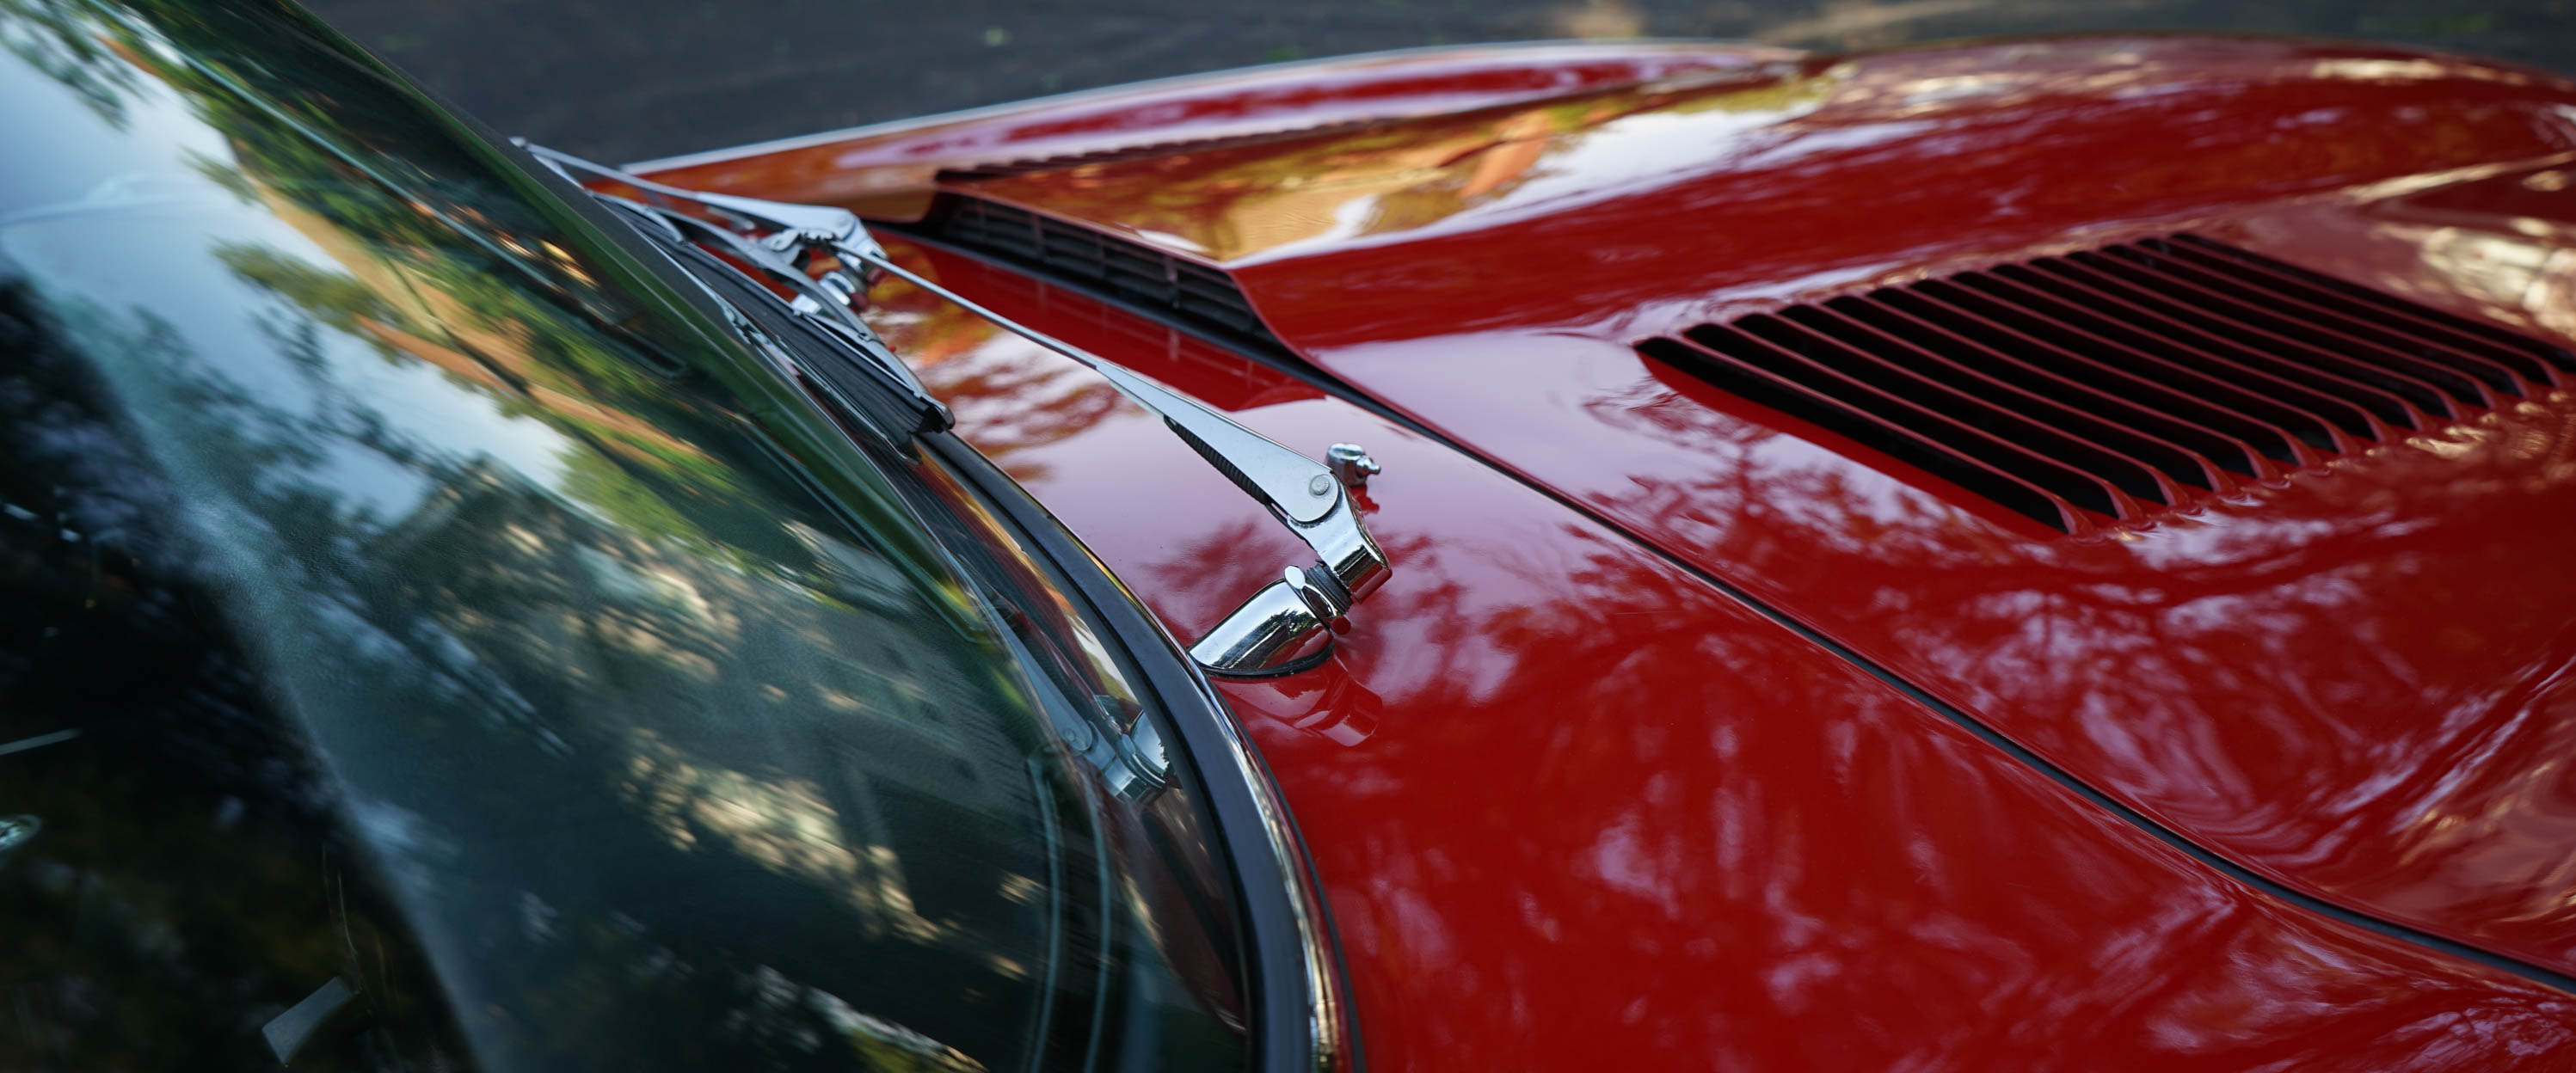 1966-Jaguar-XKE-Red-slideshow-0062x.jpg